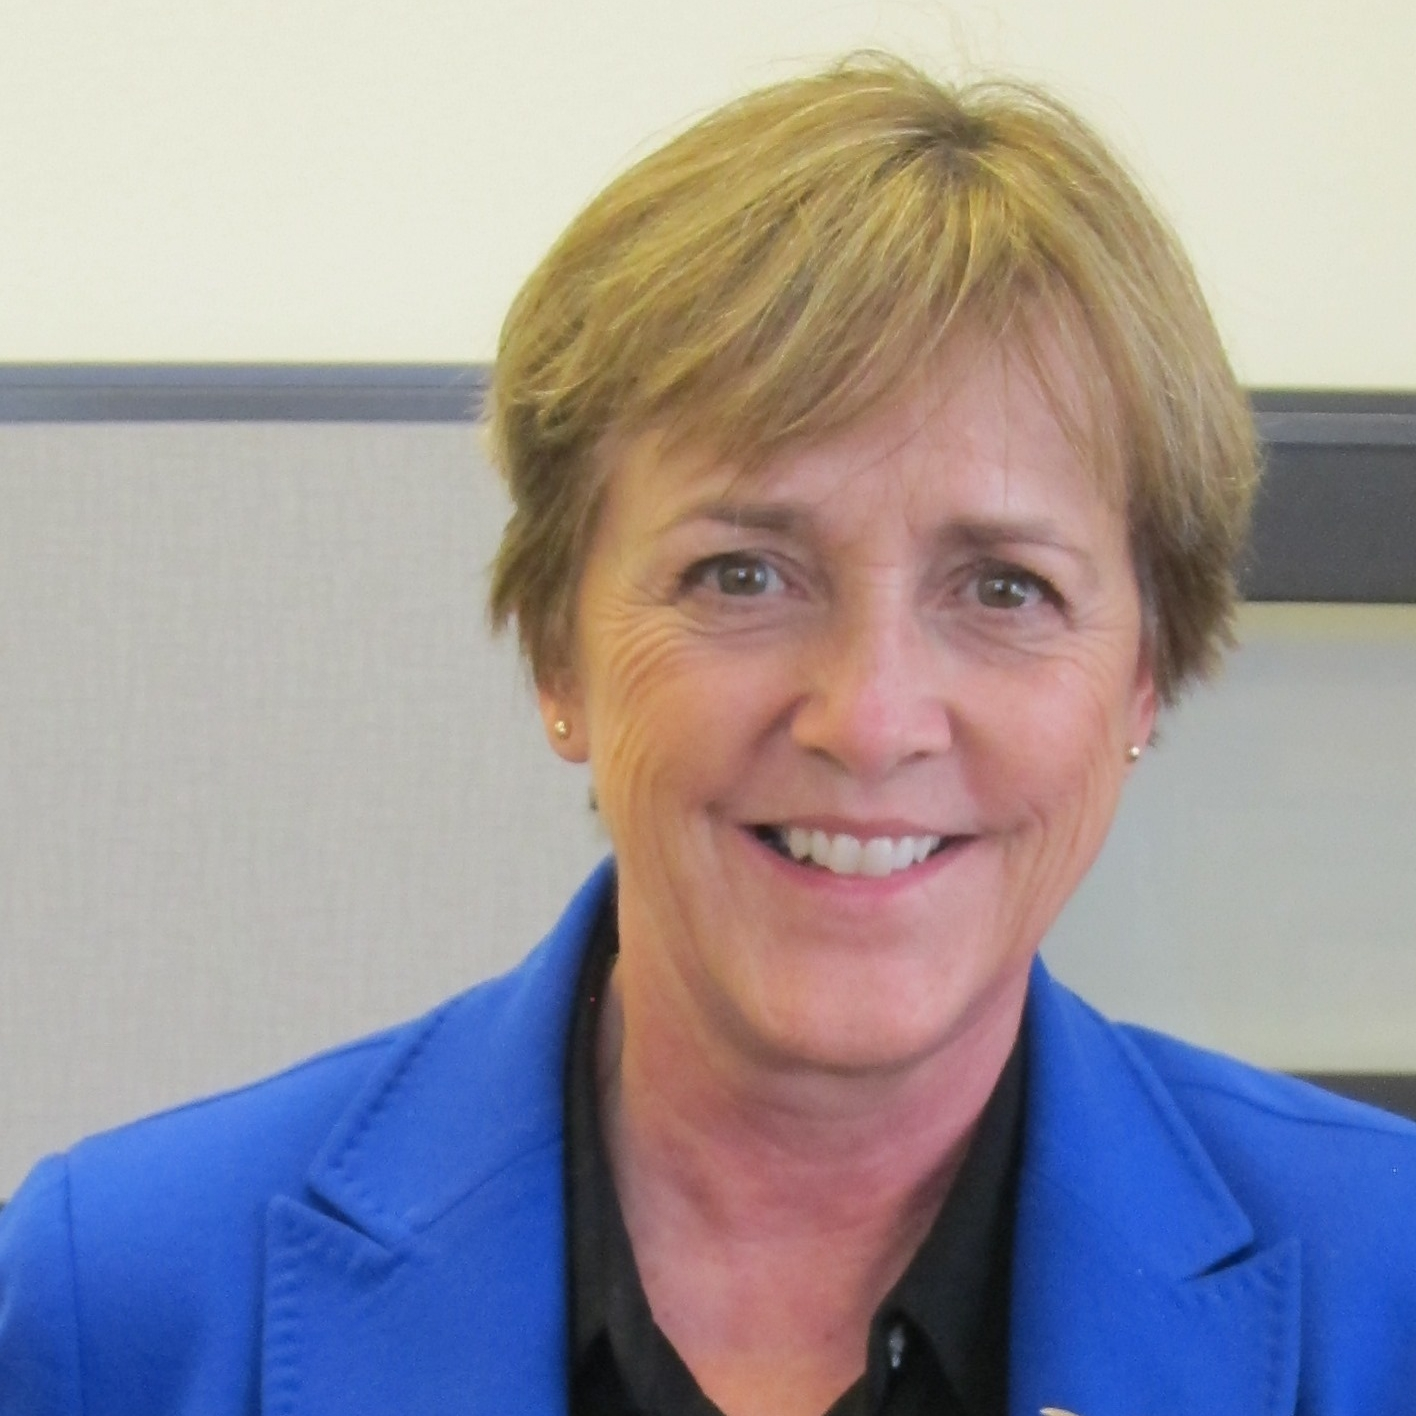 Kathy J. Kuipers